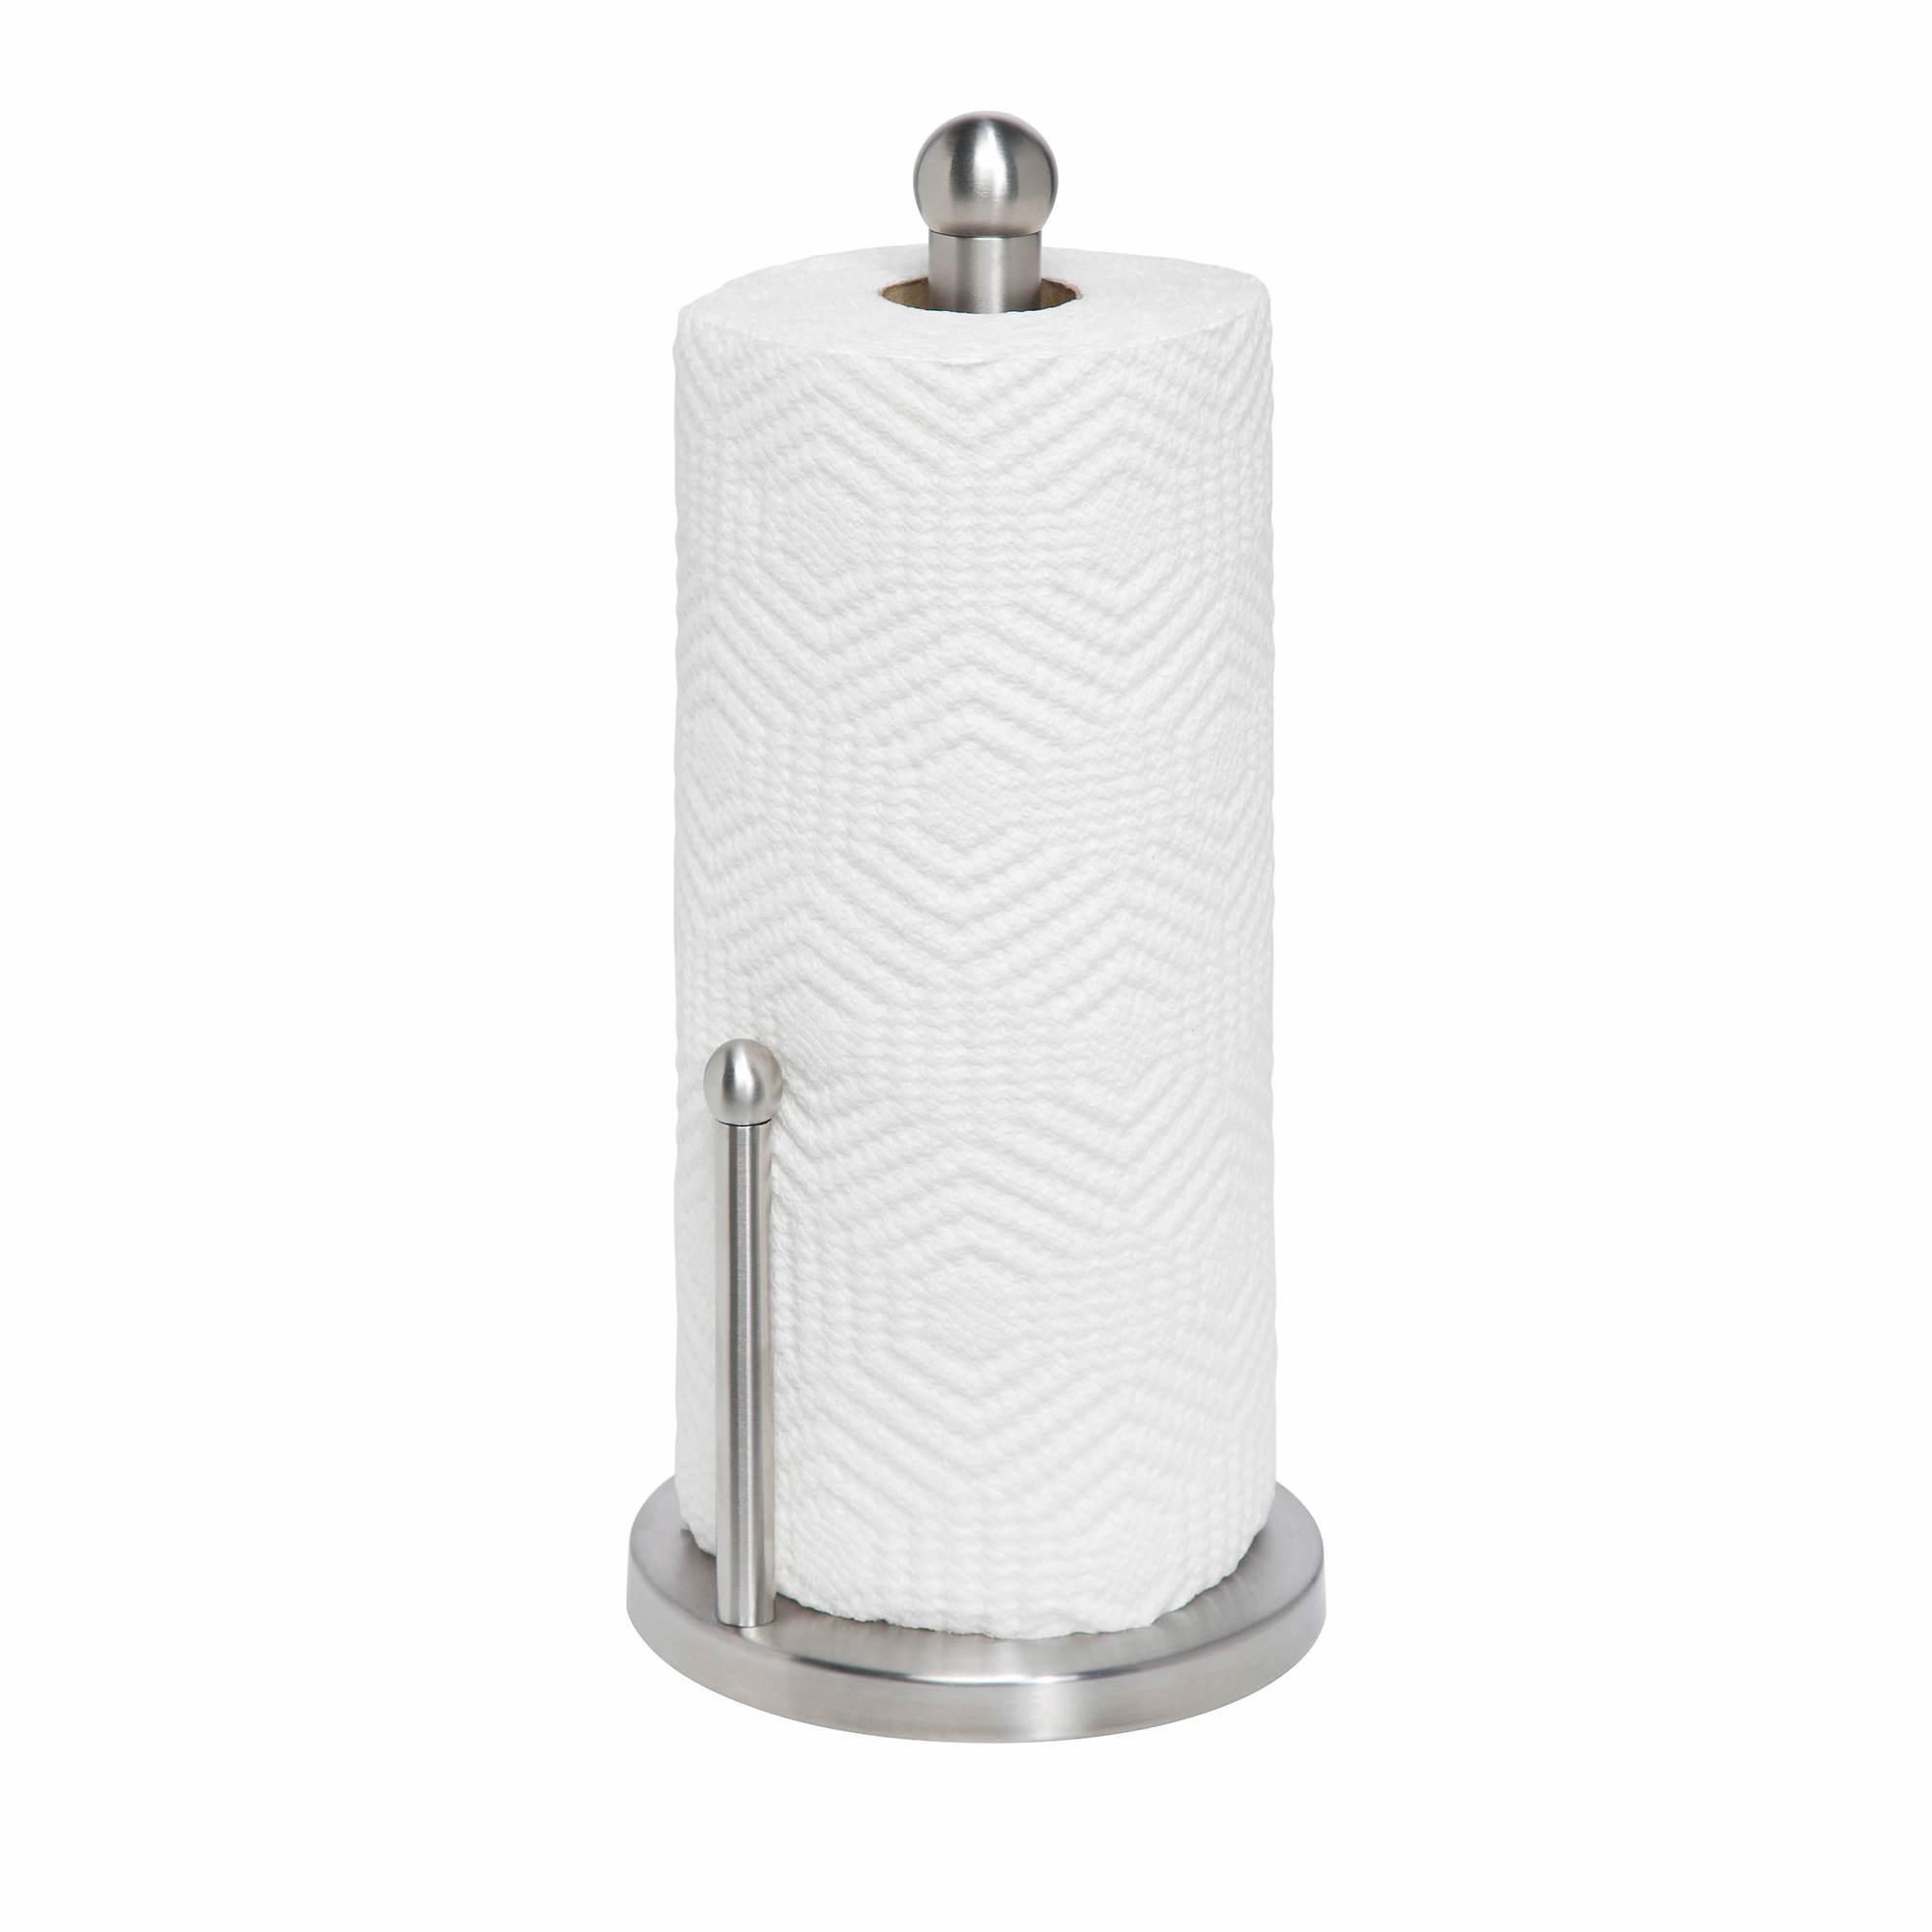 Travel Paper Towel Holder: Honey-Can-Do Stainless Steel Paper Towel Holder